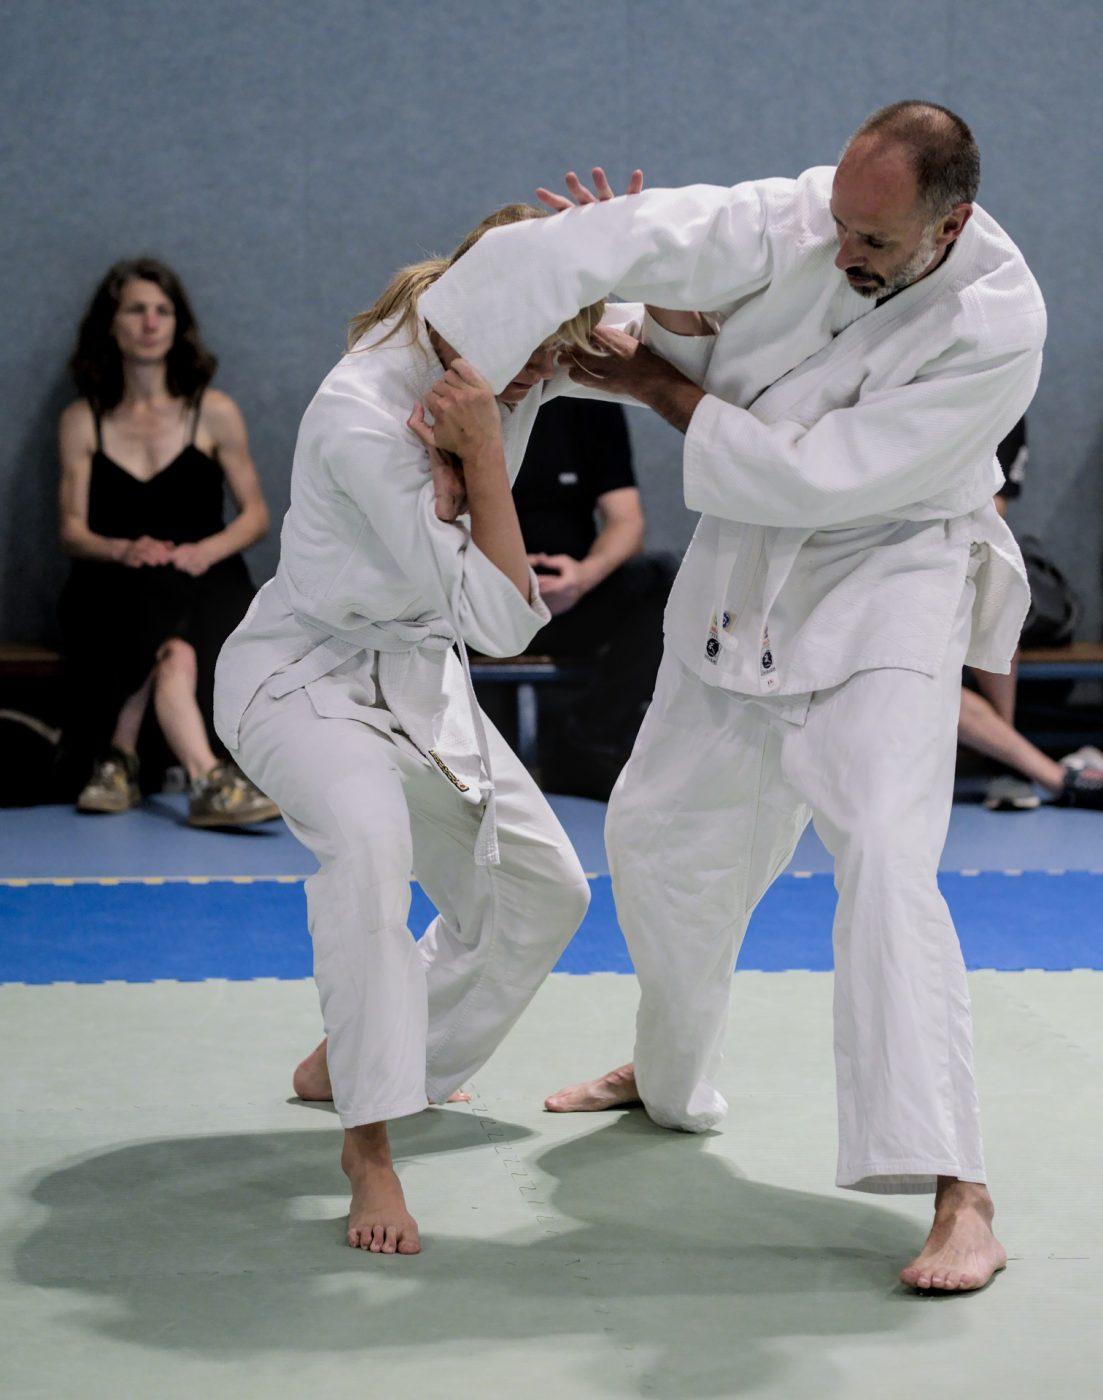 shodan-zwarte-band-aikido